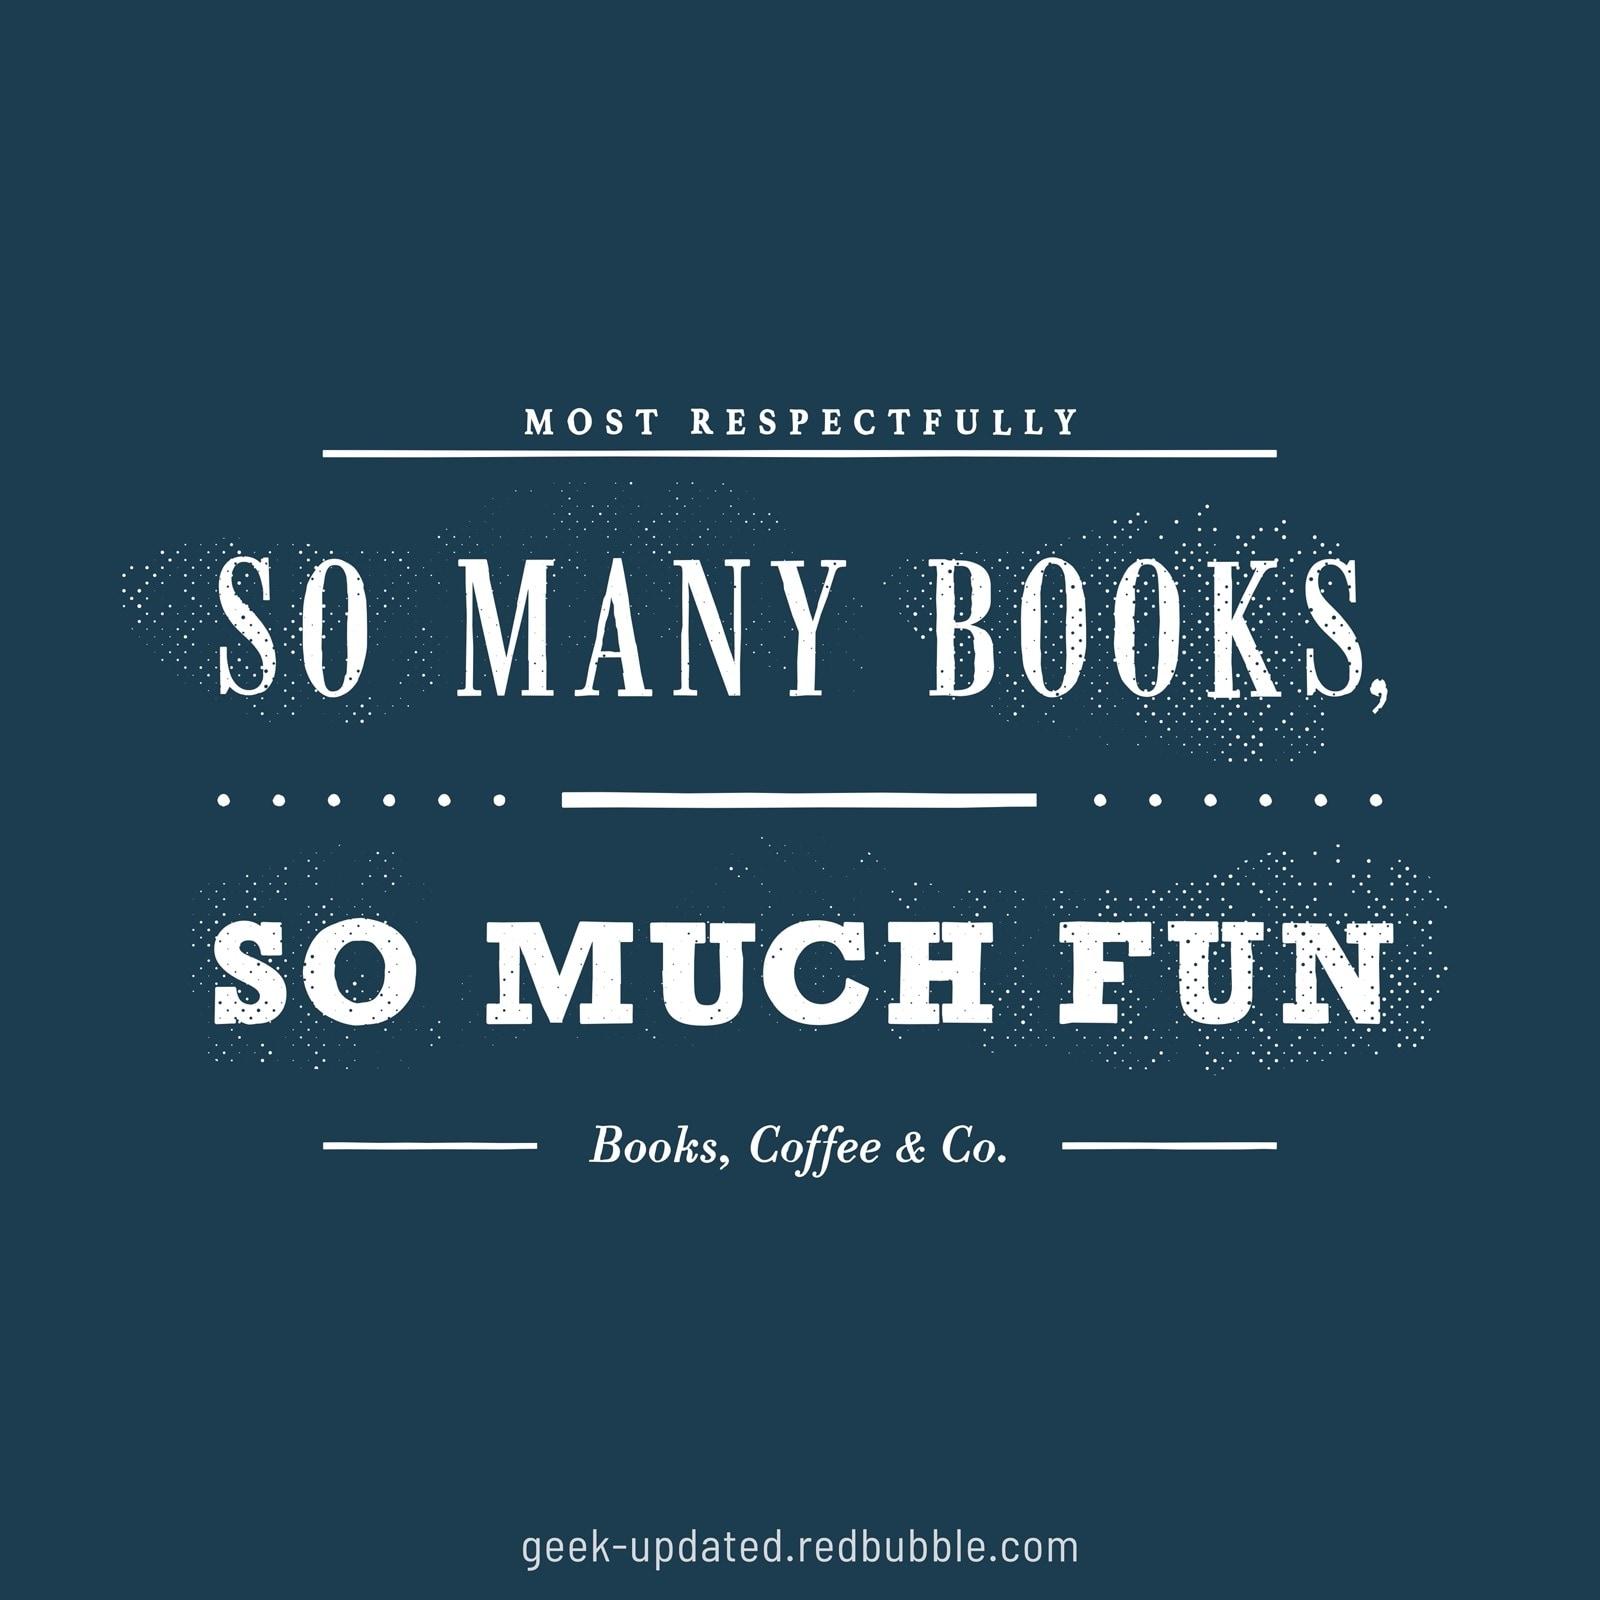 So many books so much fun - design by Piotr Kowalczyk